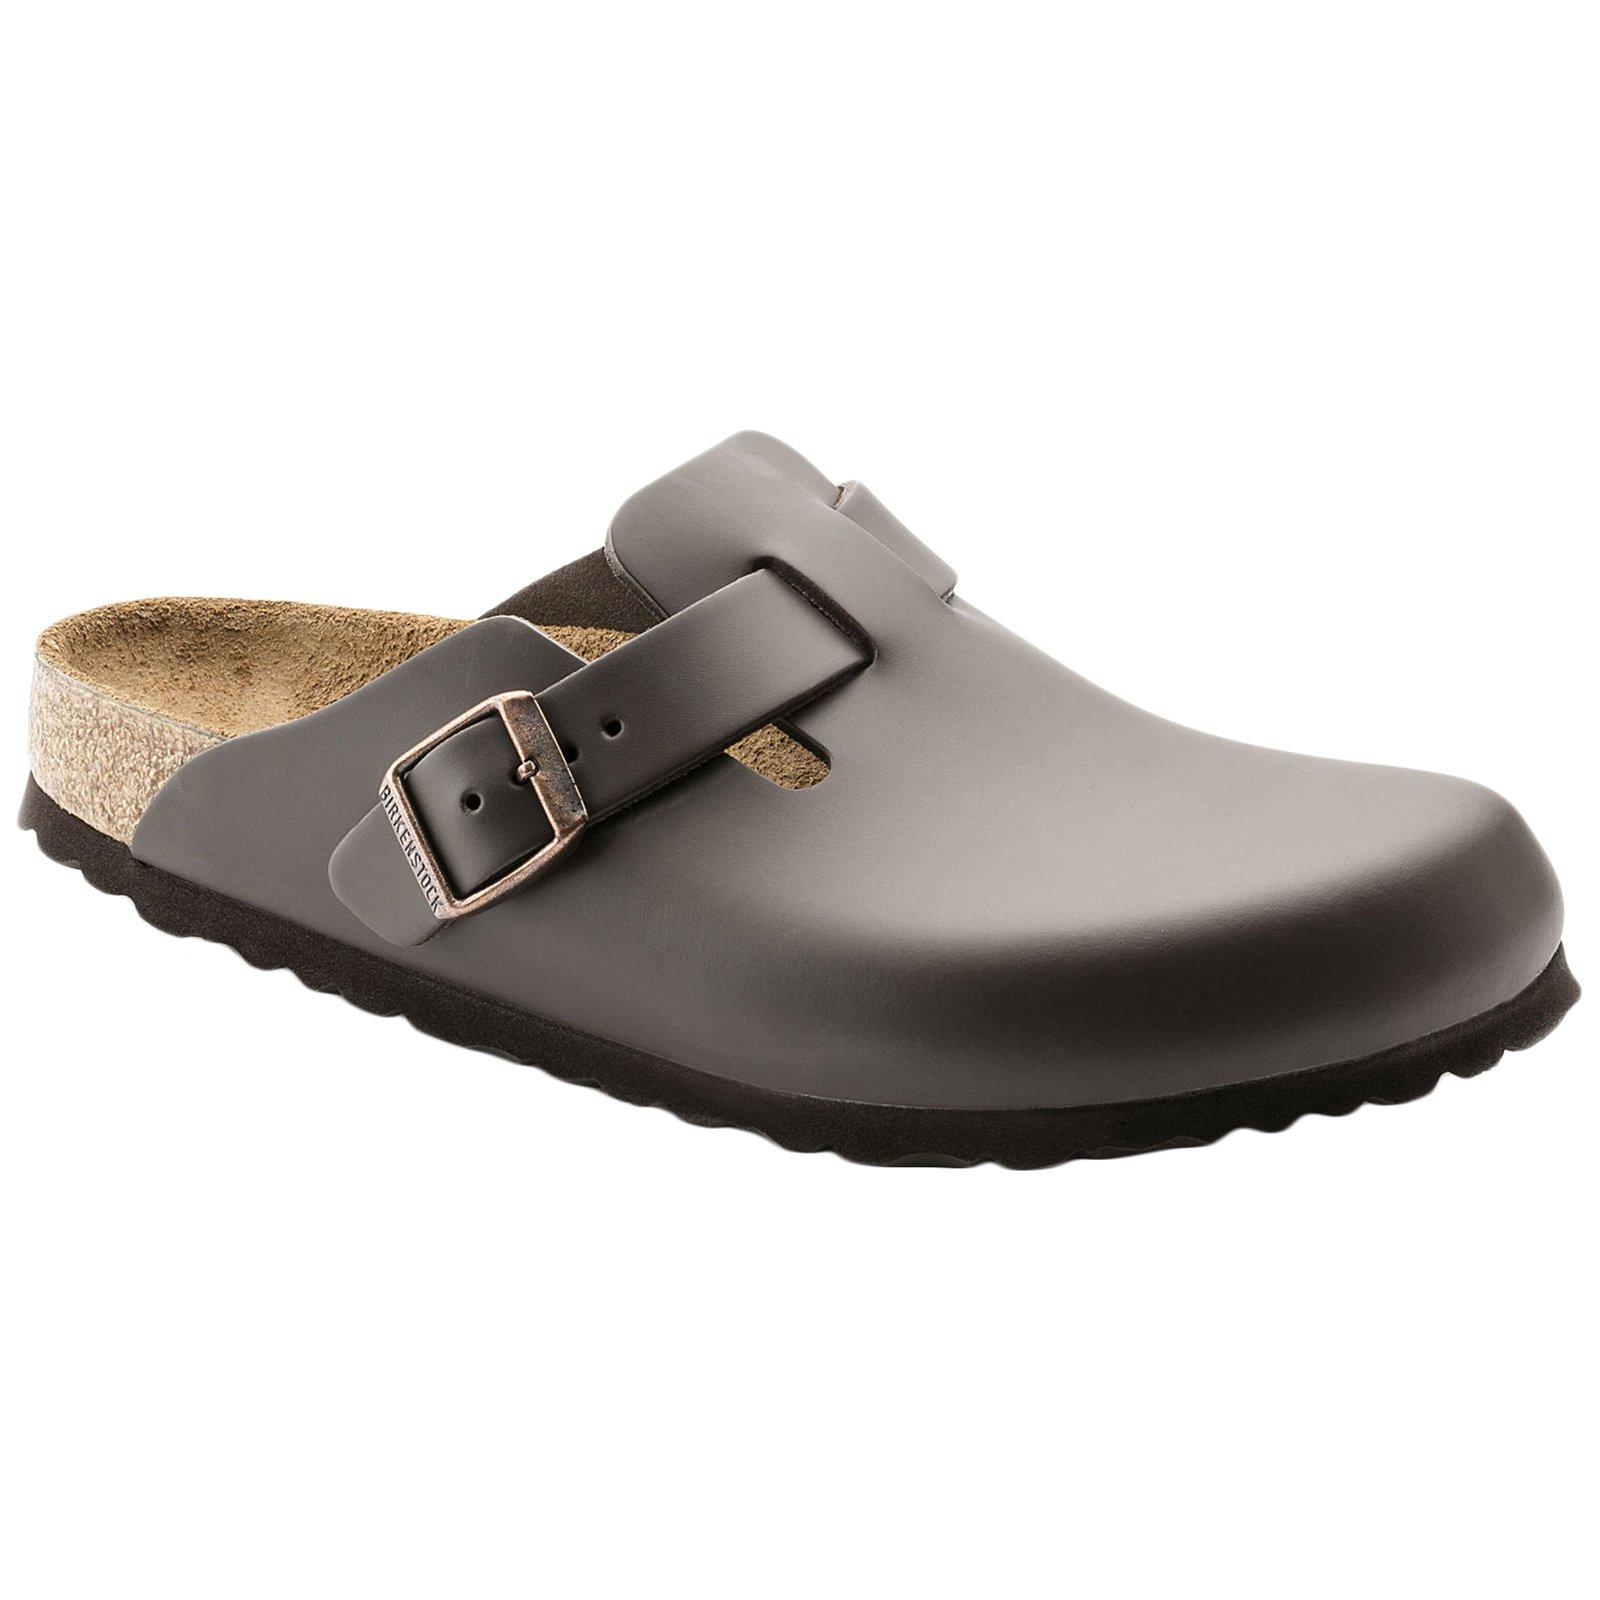 Birkenstock Boston, Unisex Adults' Clogs, Dark Brown Leather,7 UK (40 EU)